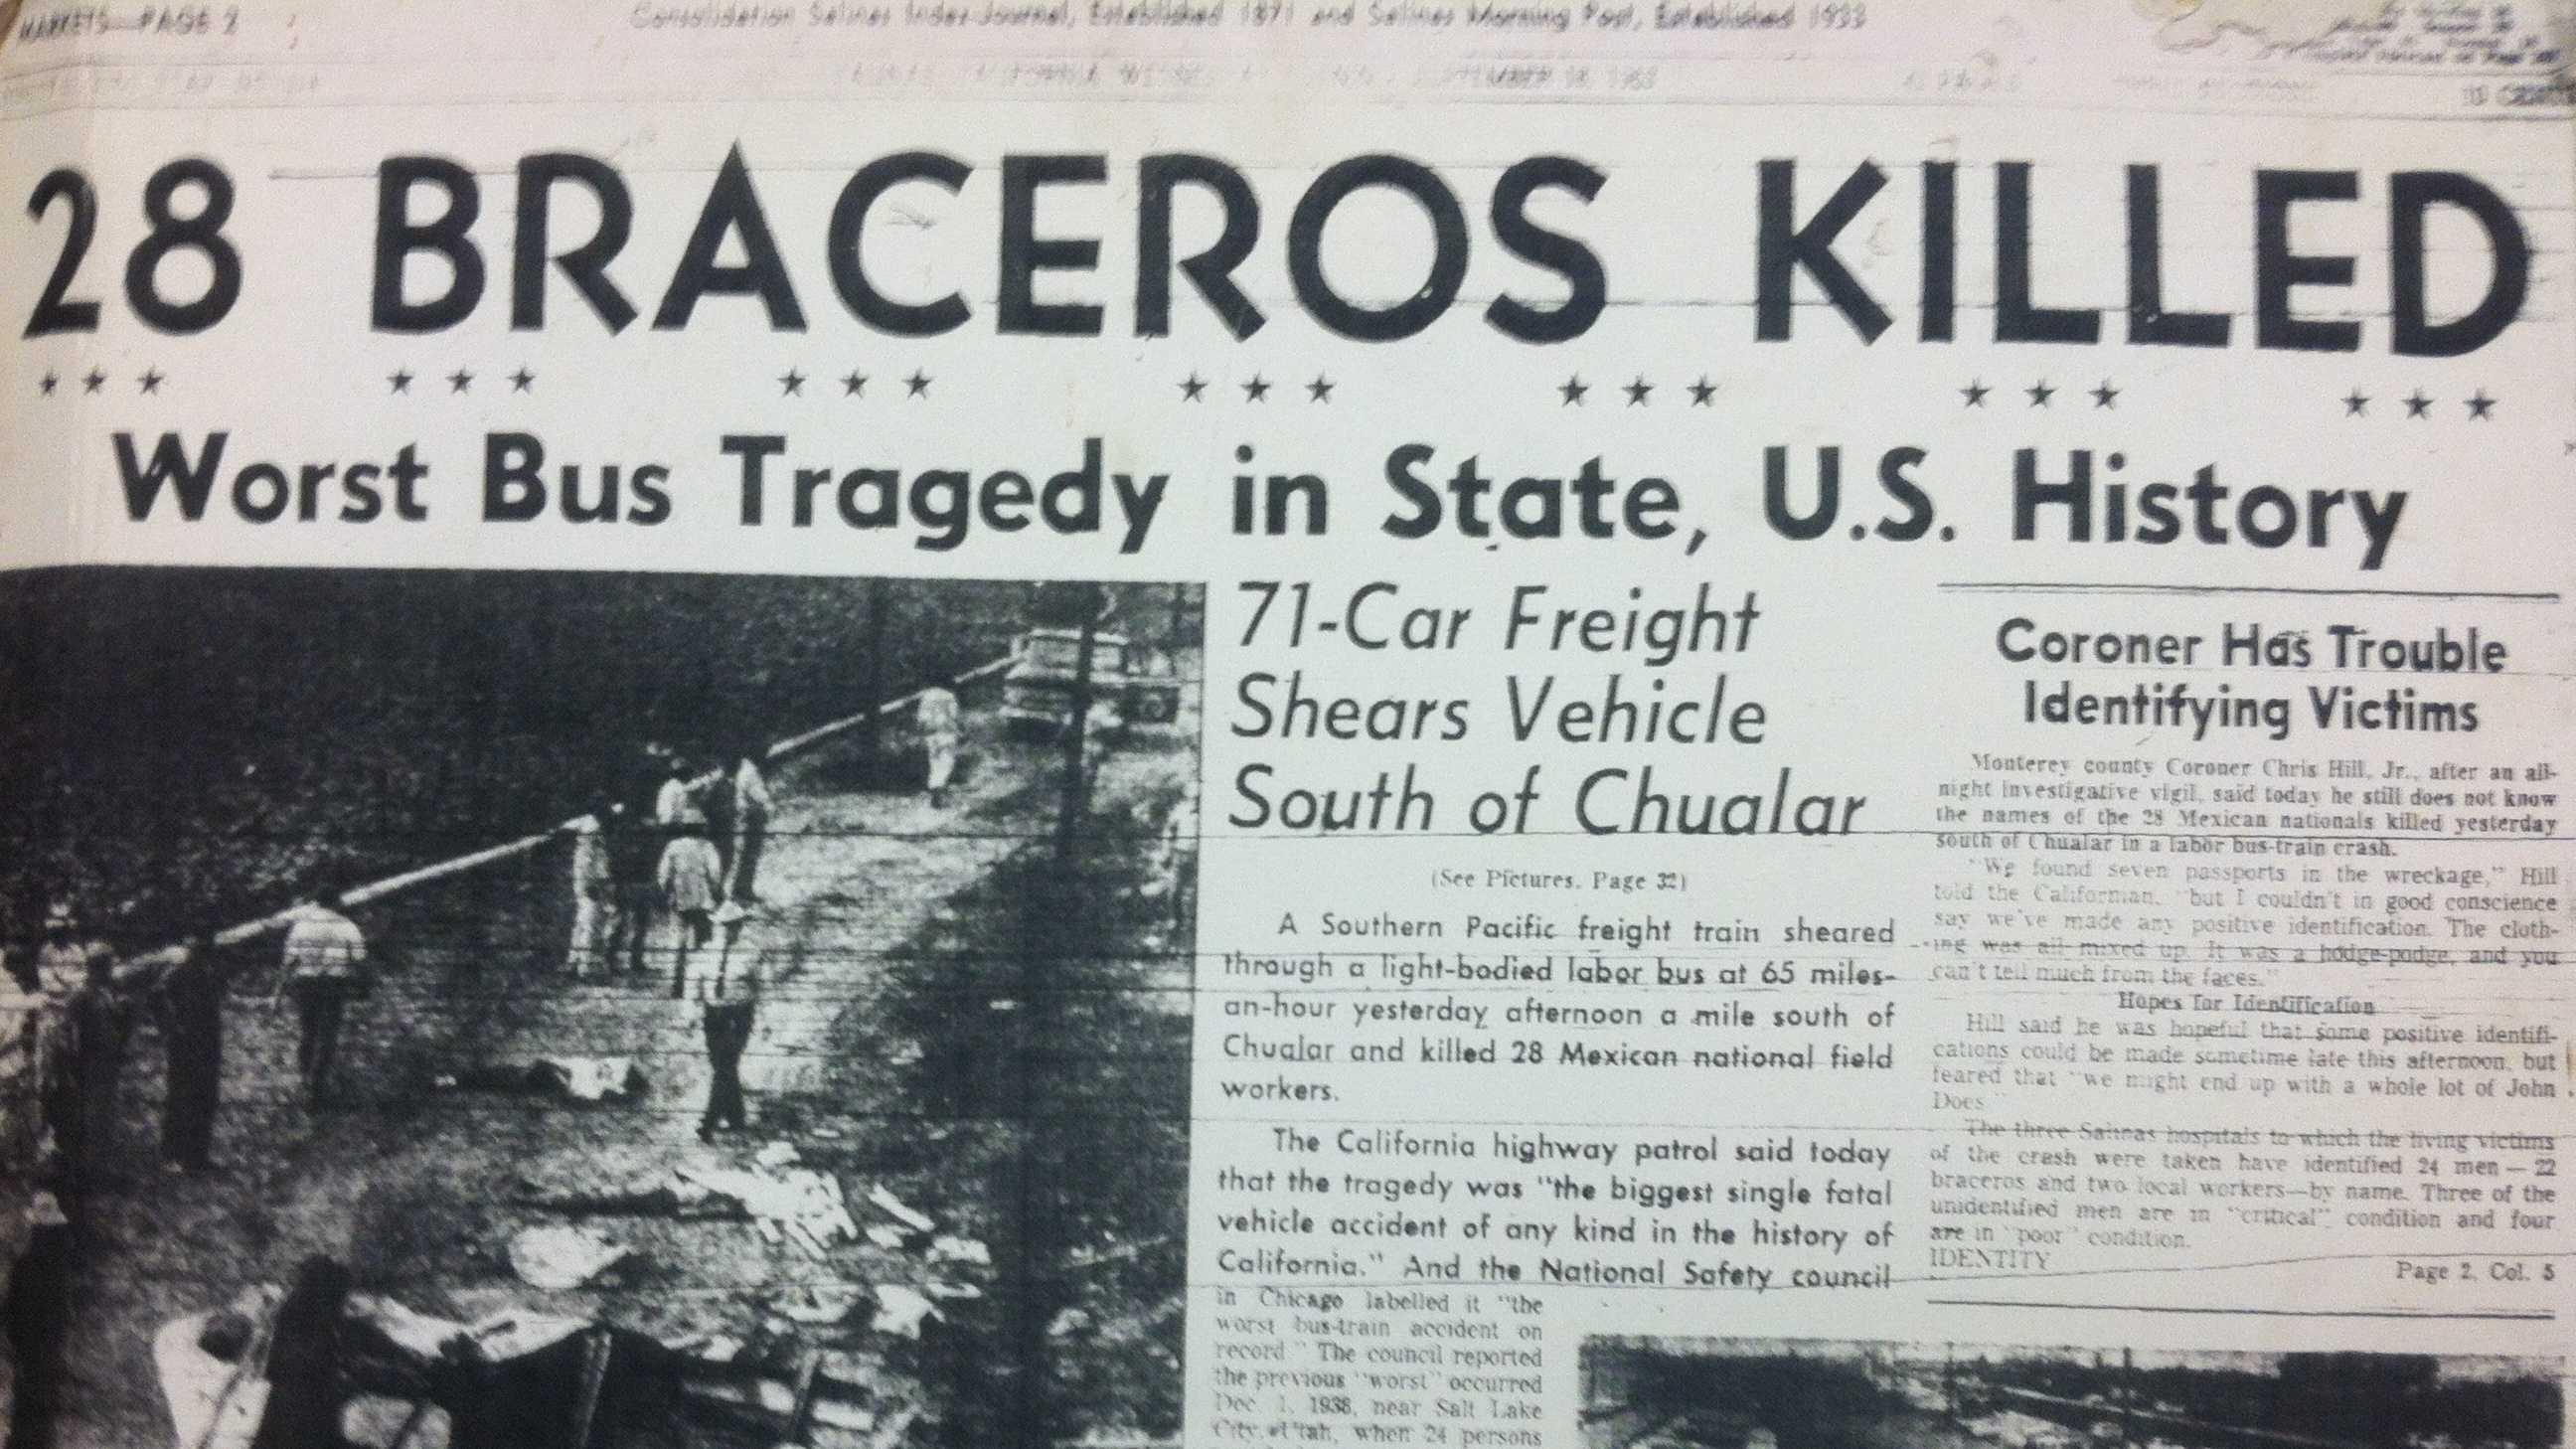 Highway 101 dedicated to Braceros 50 years after fatal crash